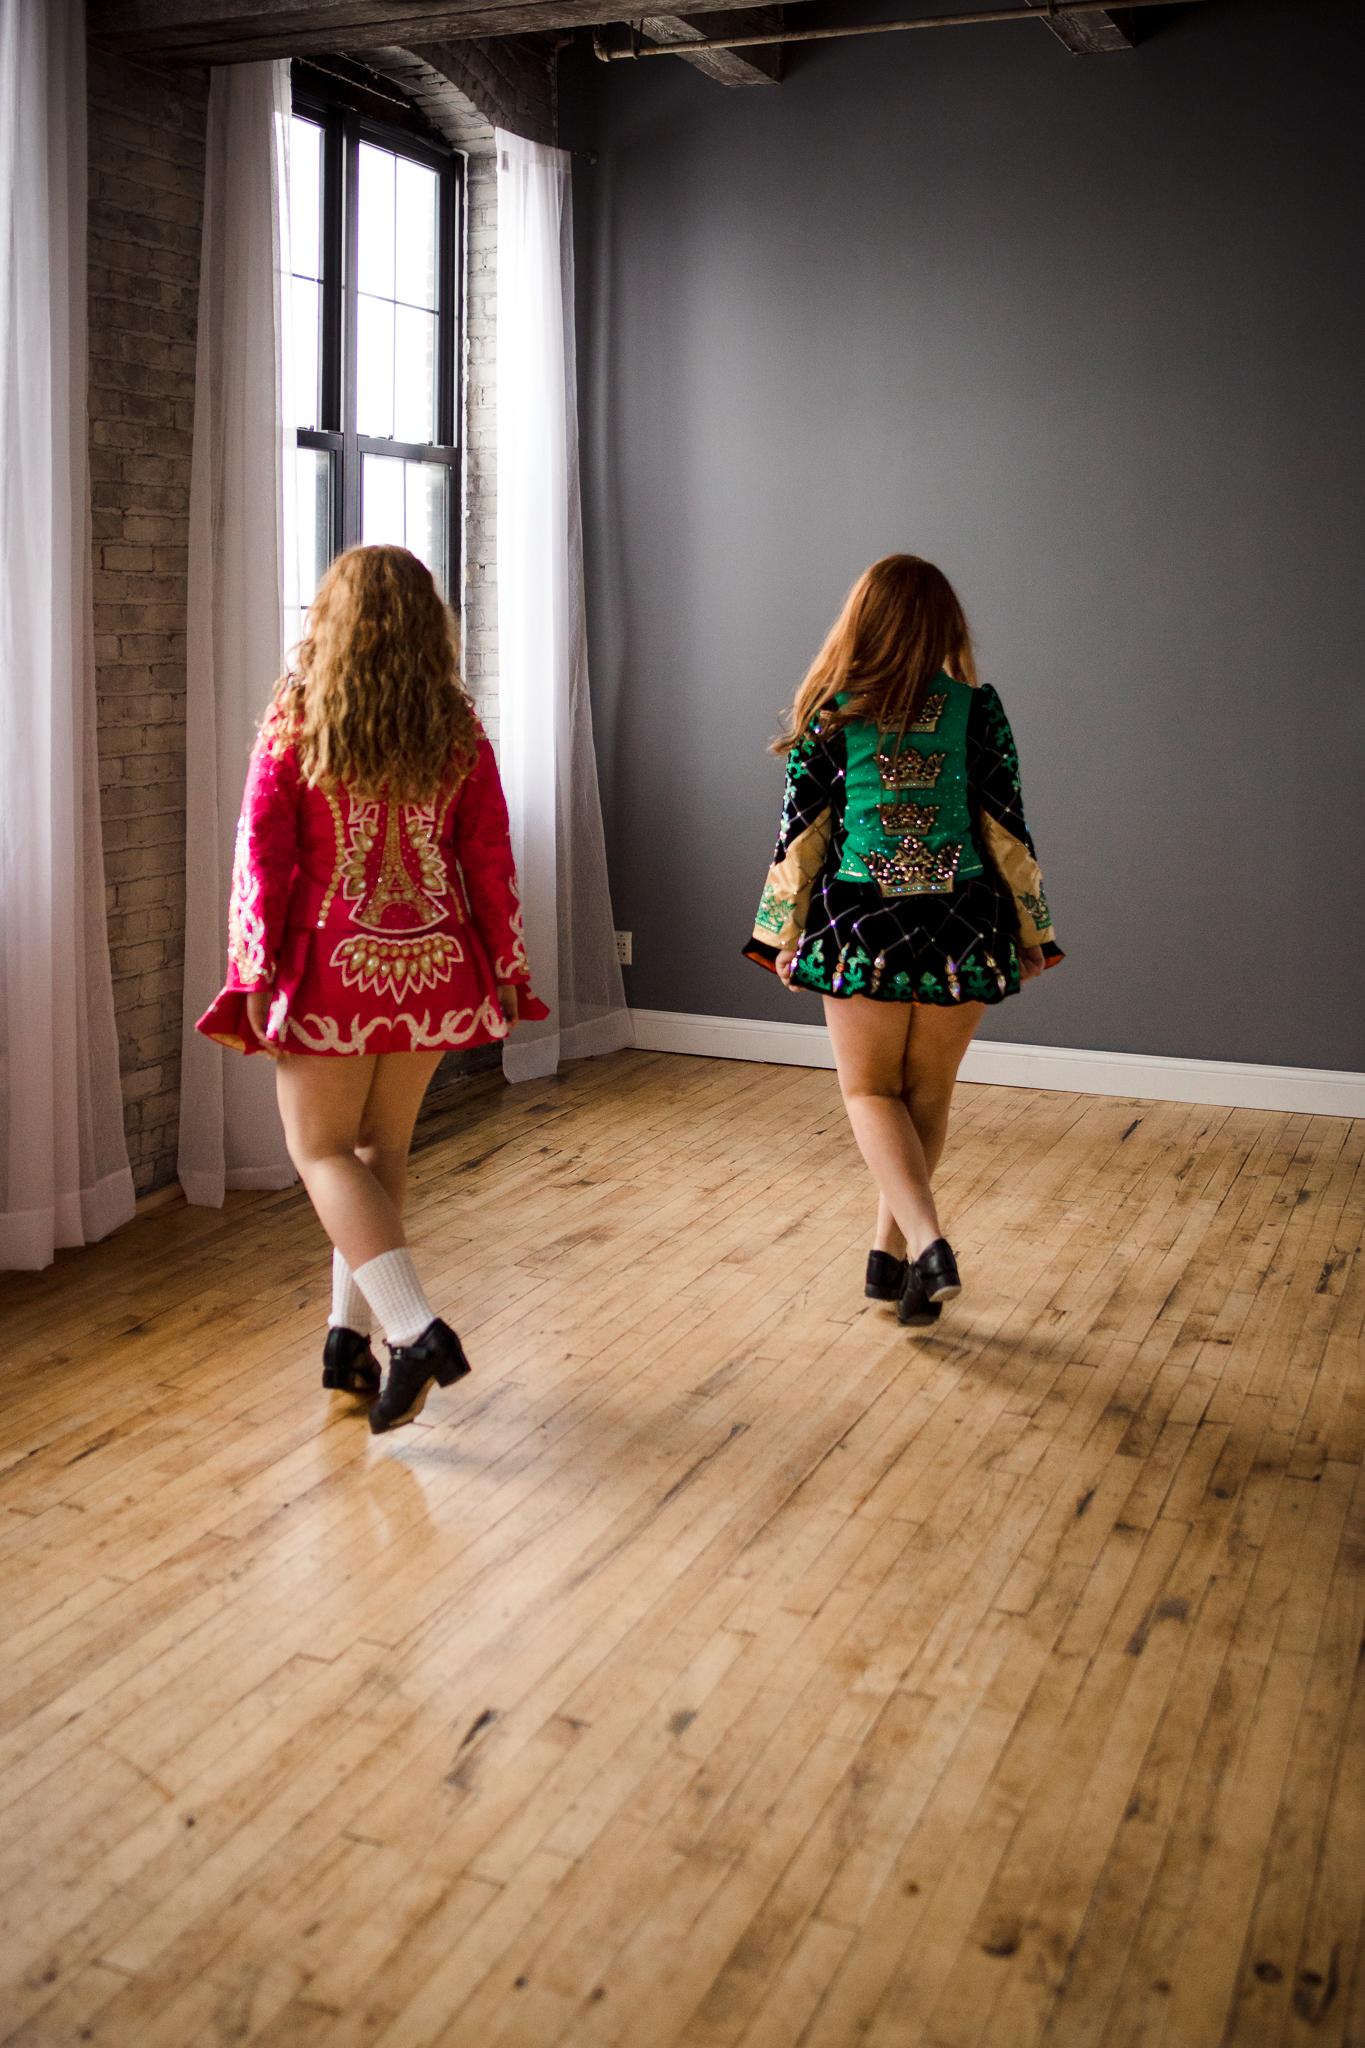 Twin Girls with red hair Irish Dancing  - Minneapolis Family Photographer